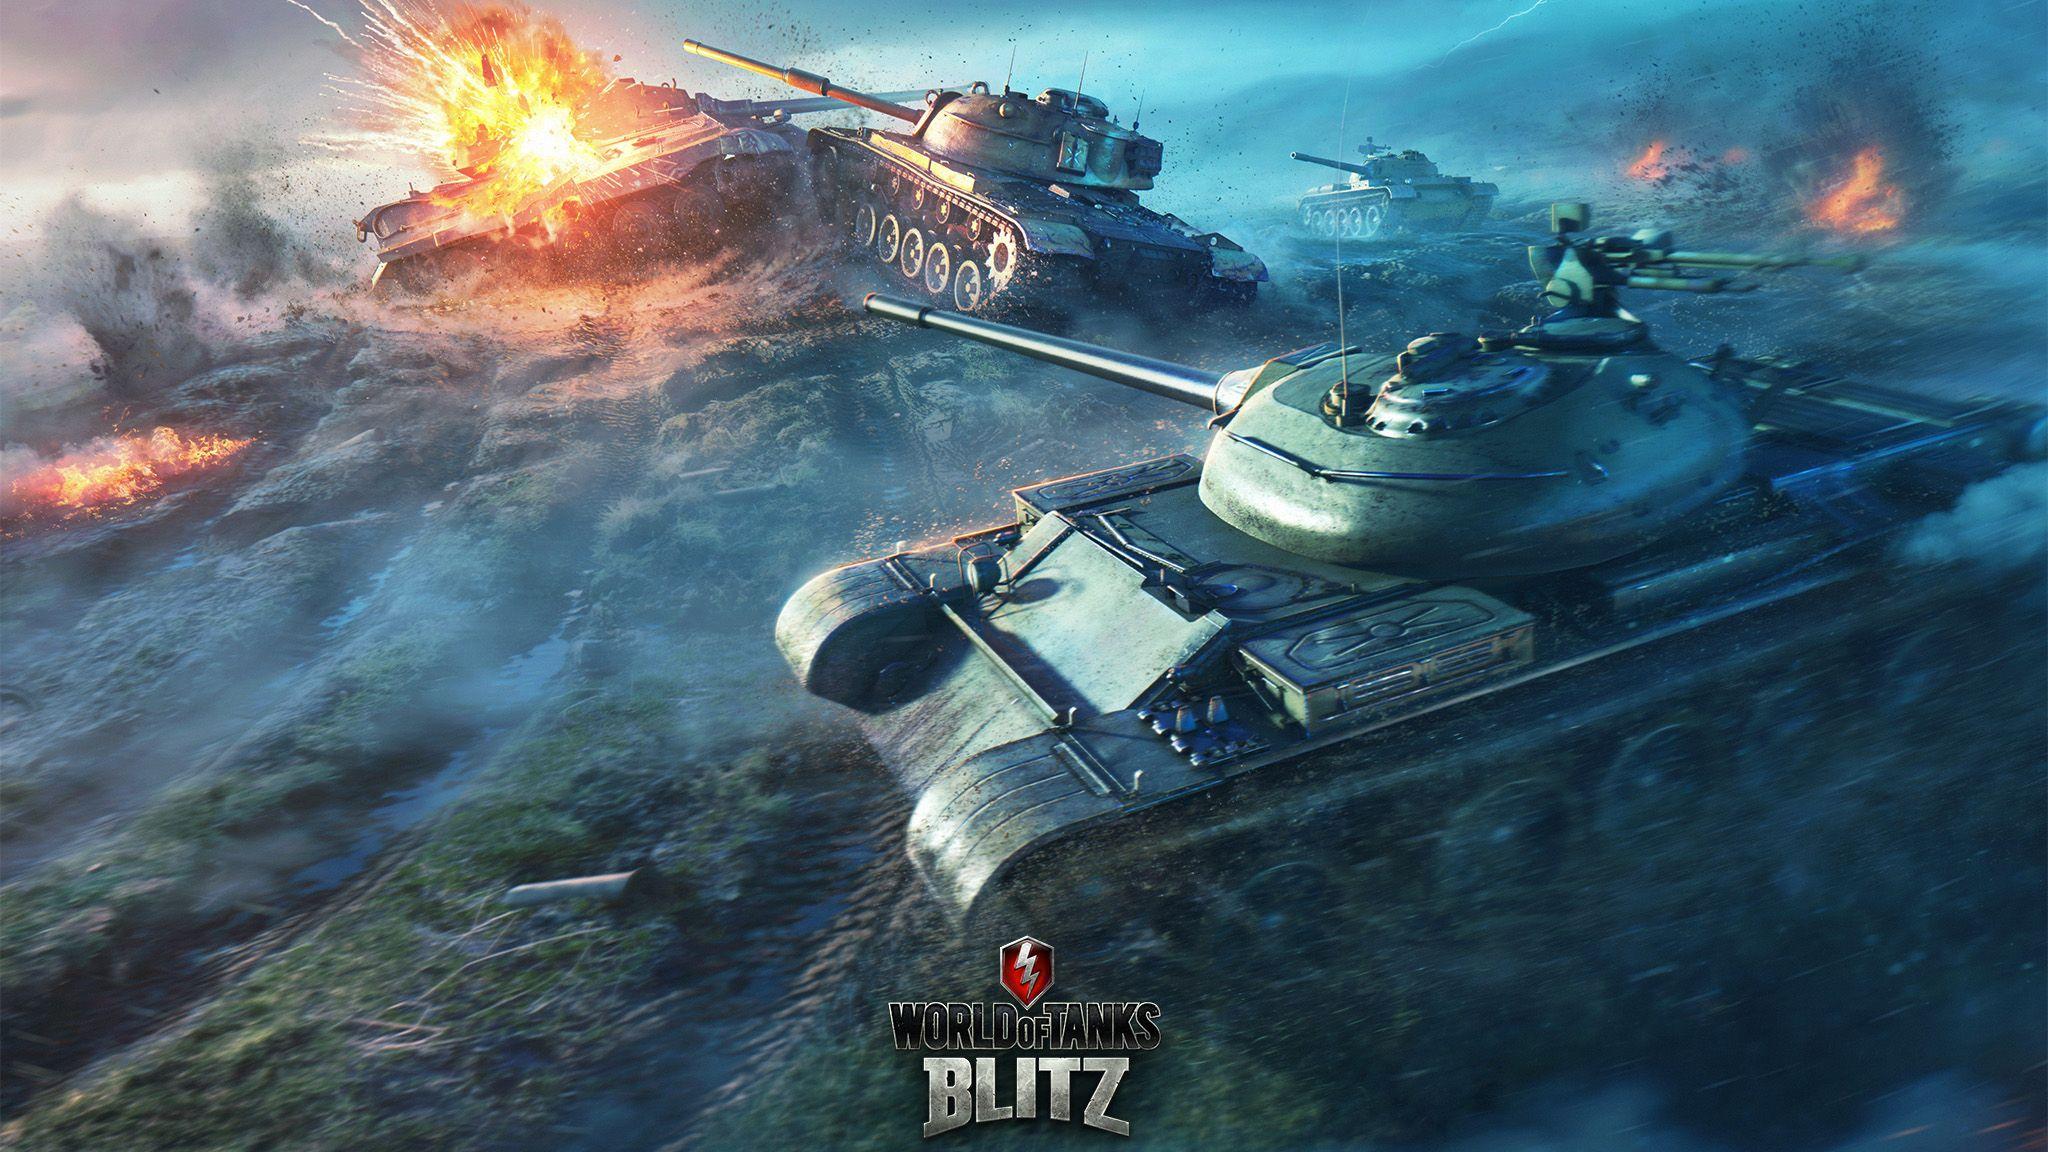 World Of Tanks Blitz Hits Steam Today Keengamer World Of Tanks Tank Blitz World